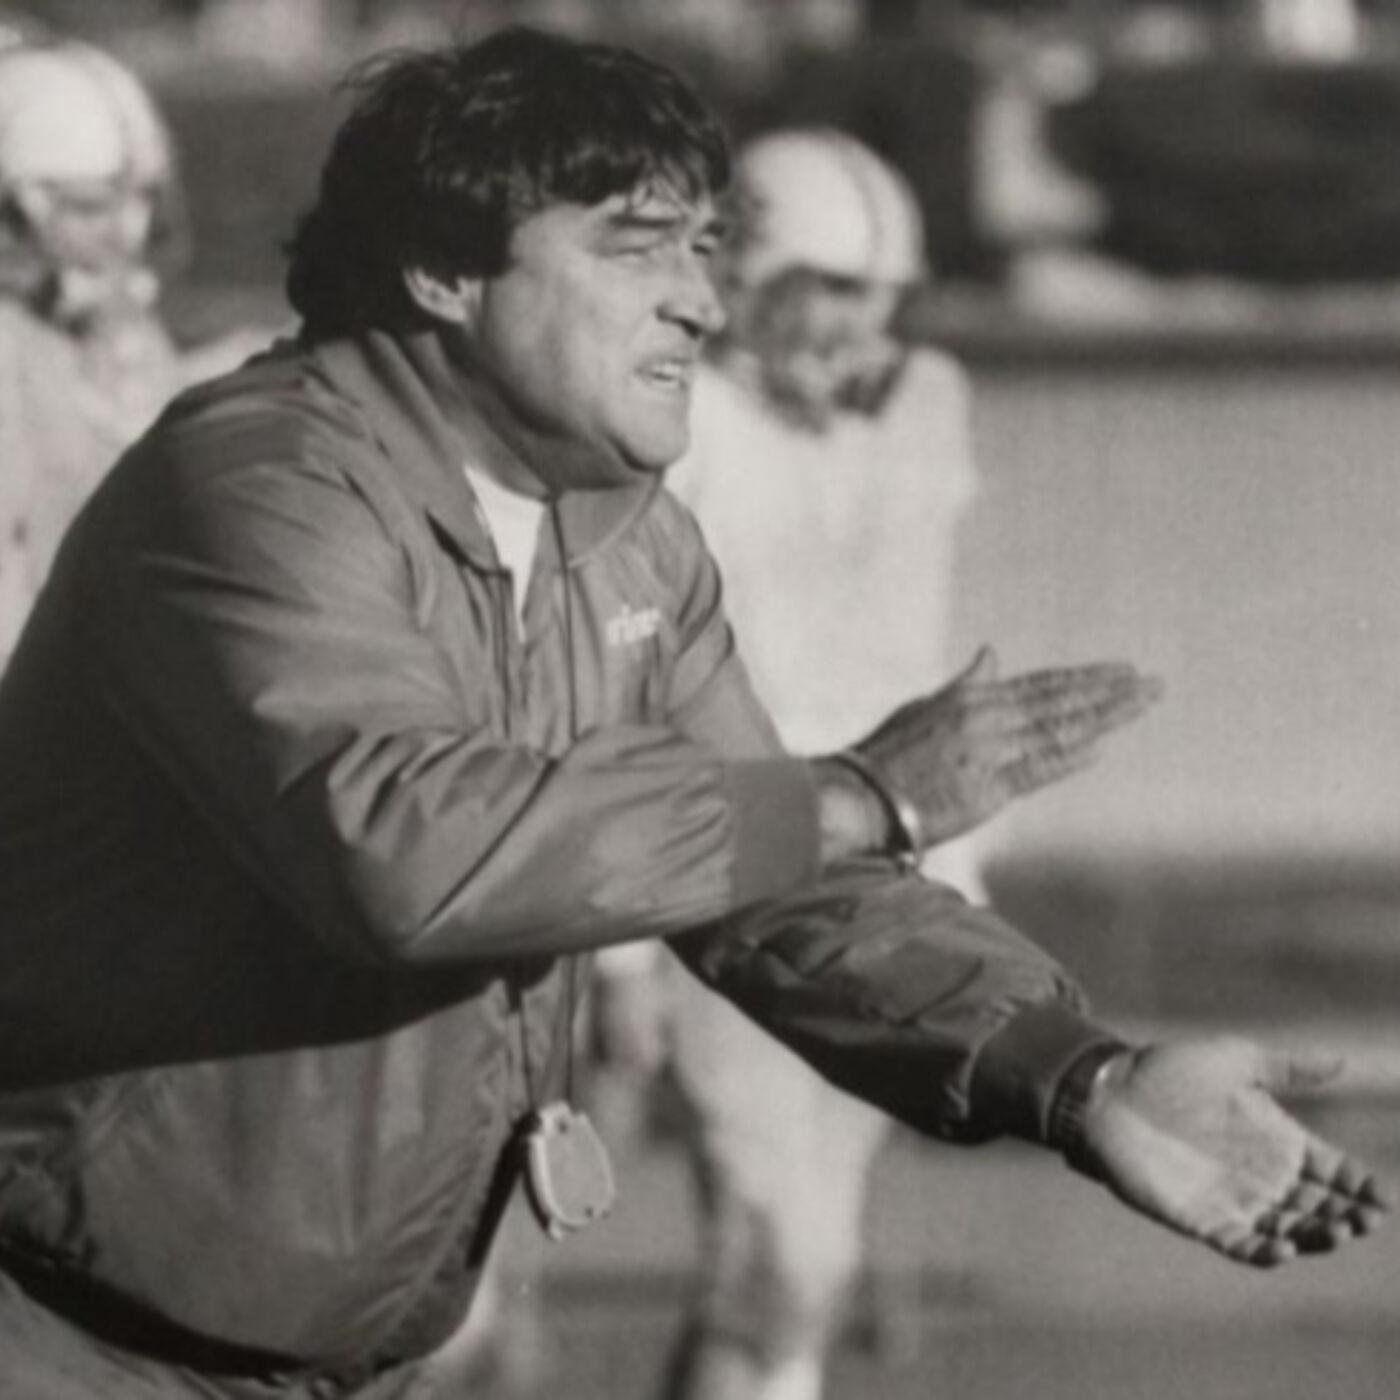 Memories of Coach Allan Cox